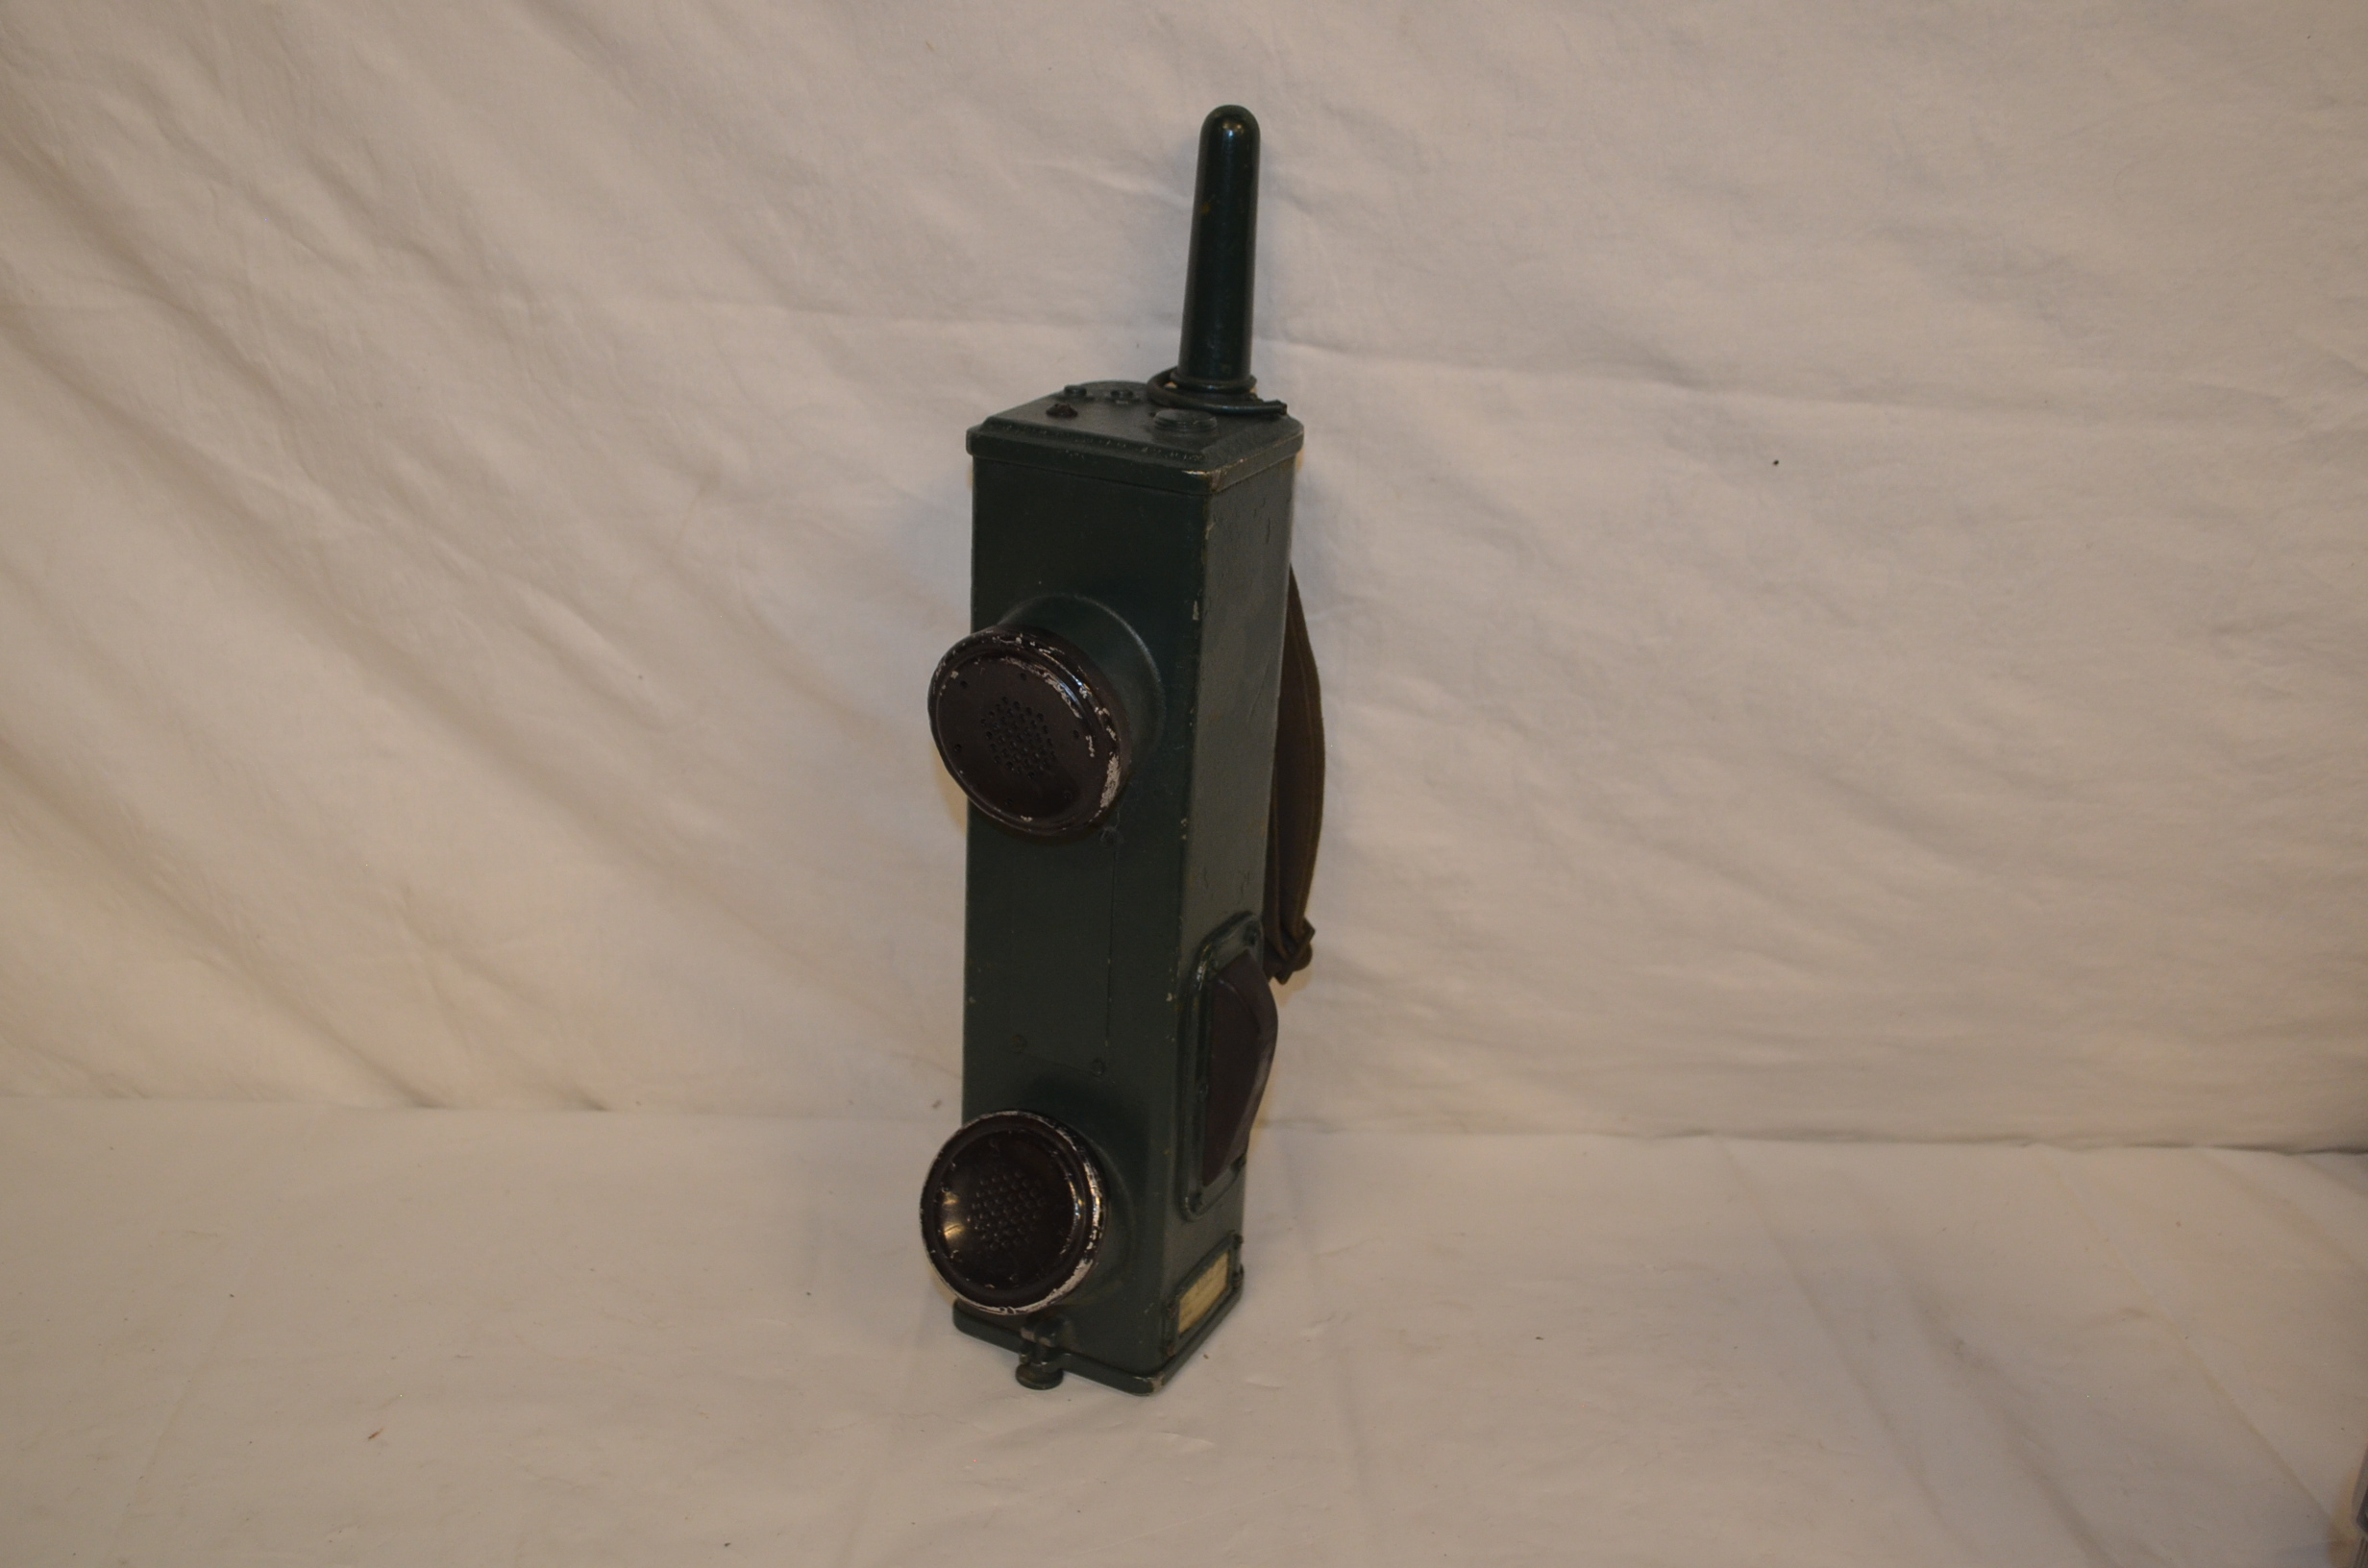 Period military walkie